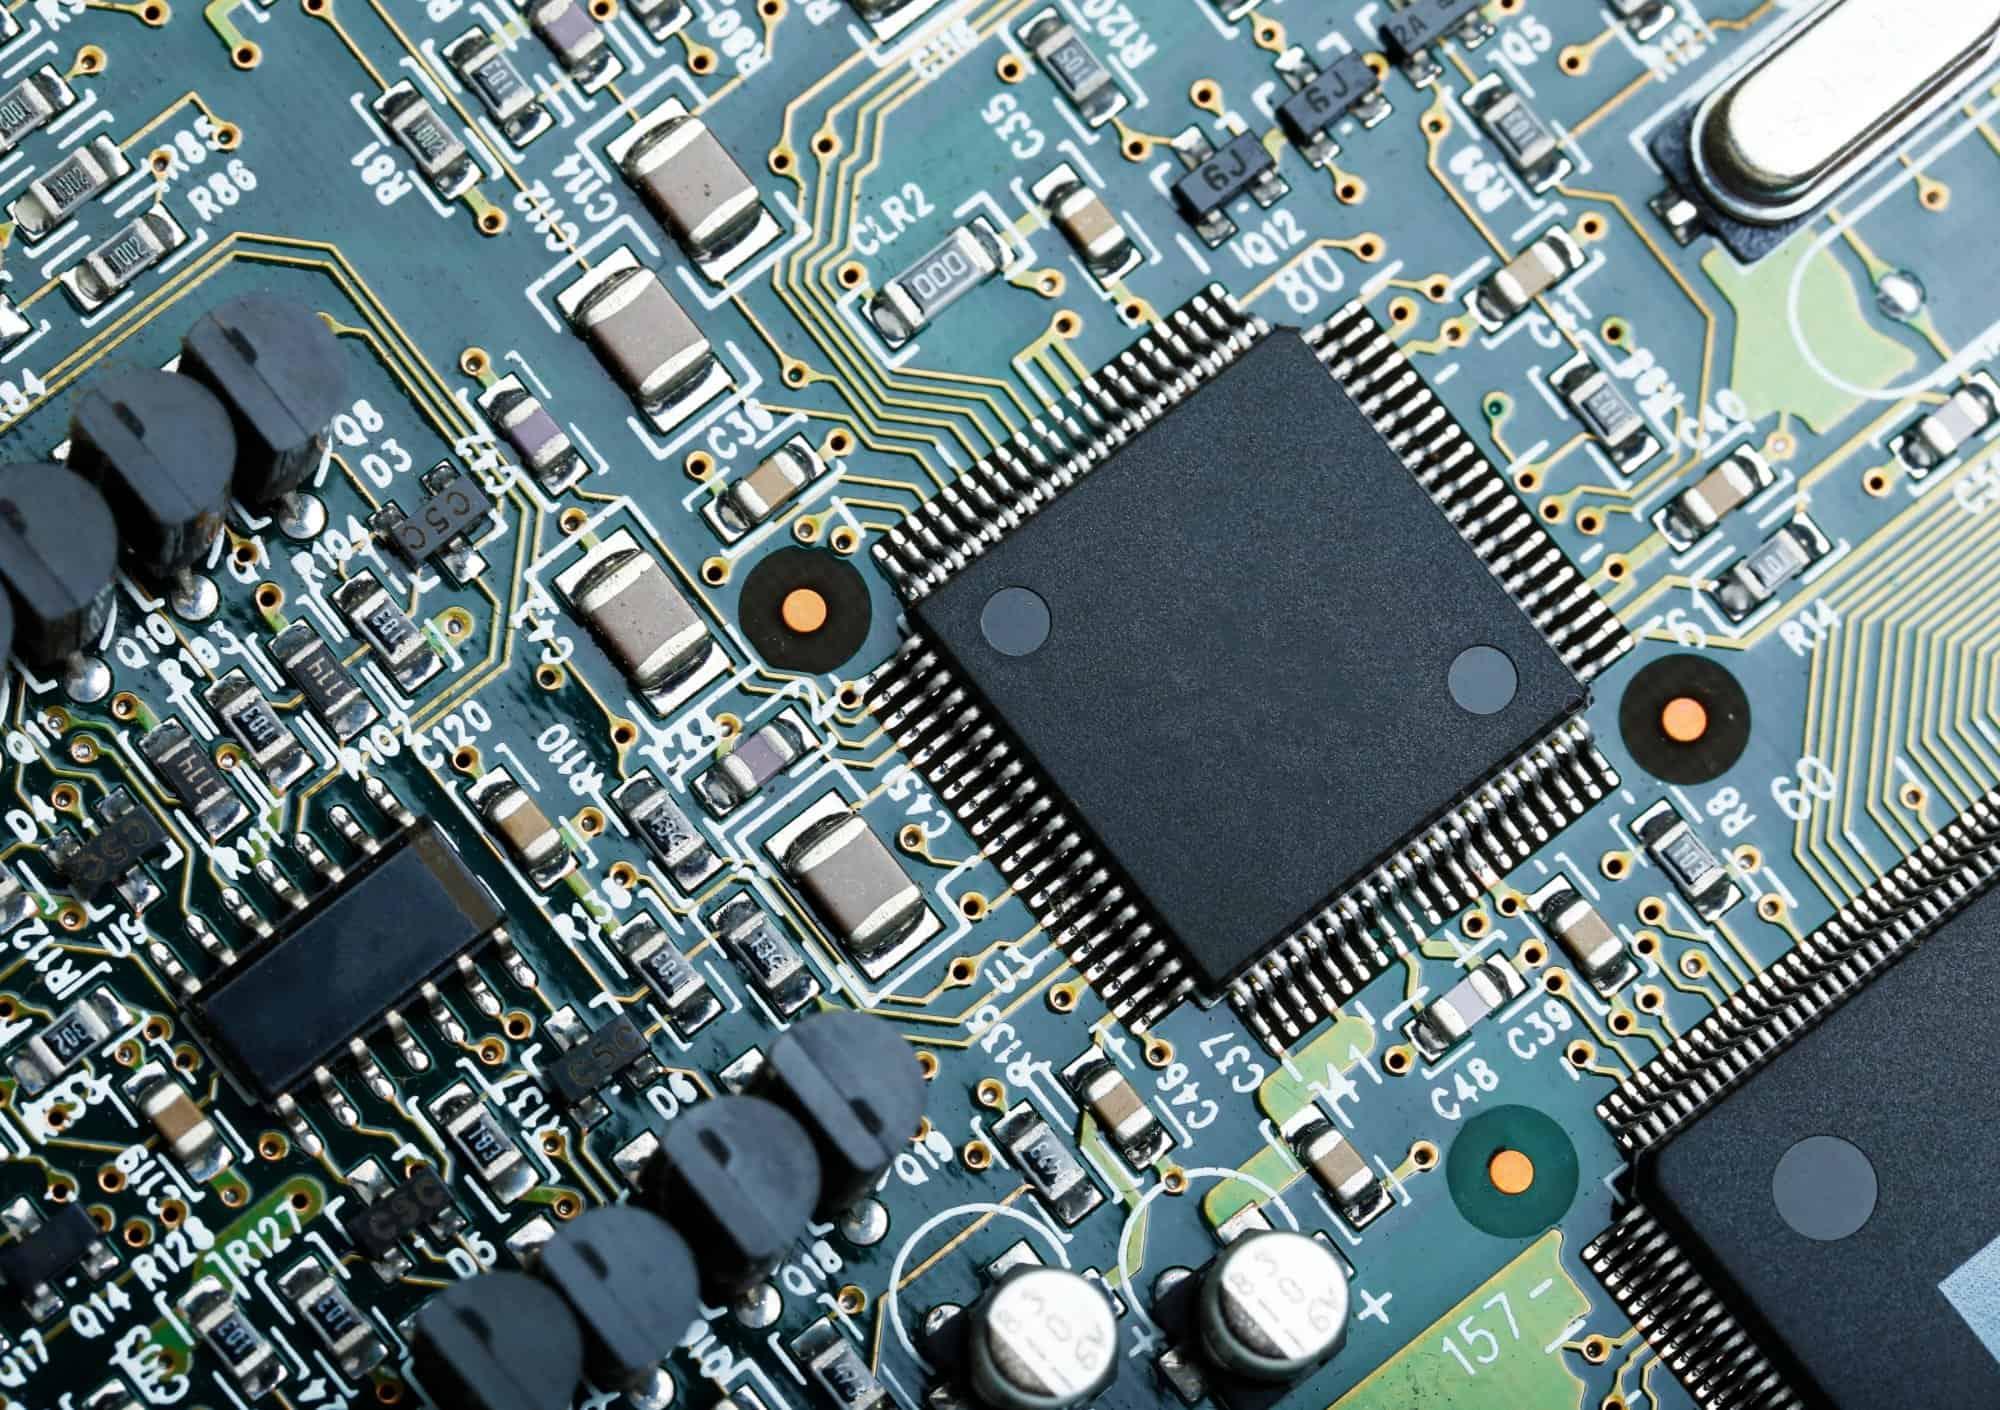 Kompilatory od podszewki - #3 - Automatyzacja procesu kompilacji, kompilatory a mikrokontrolery